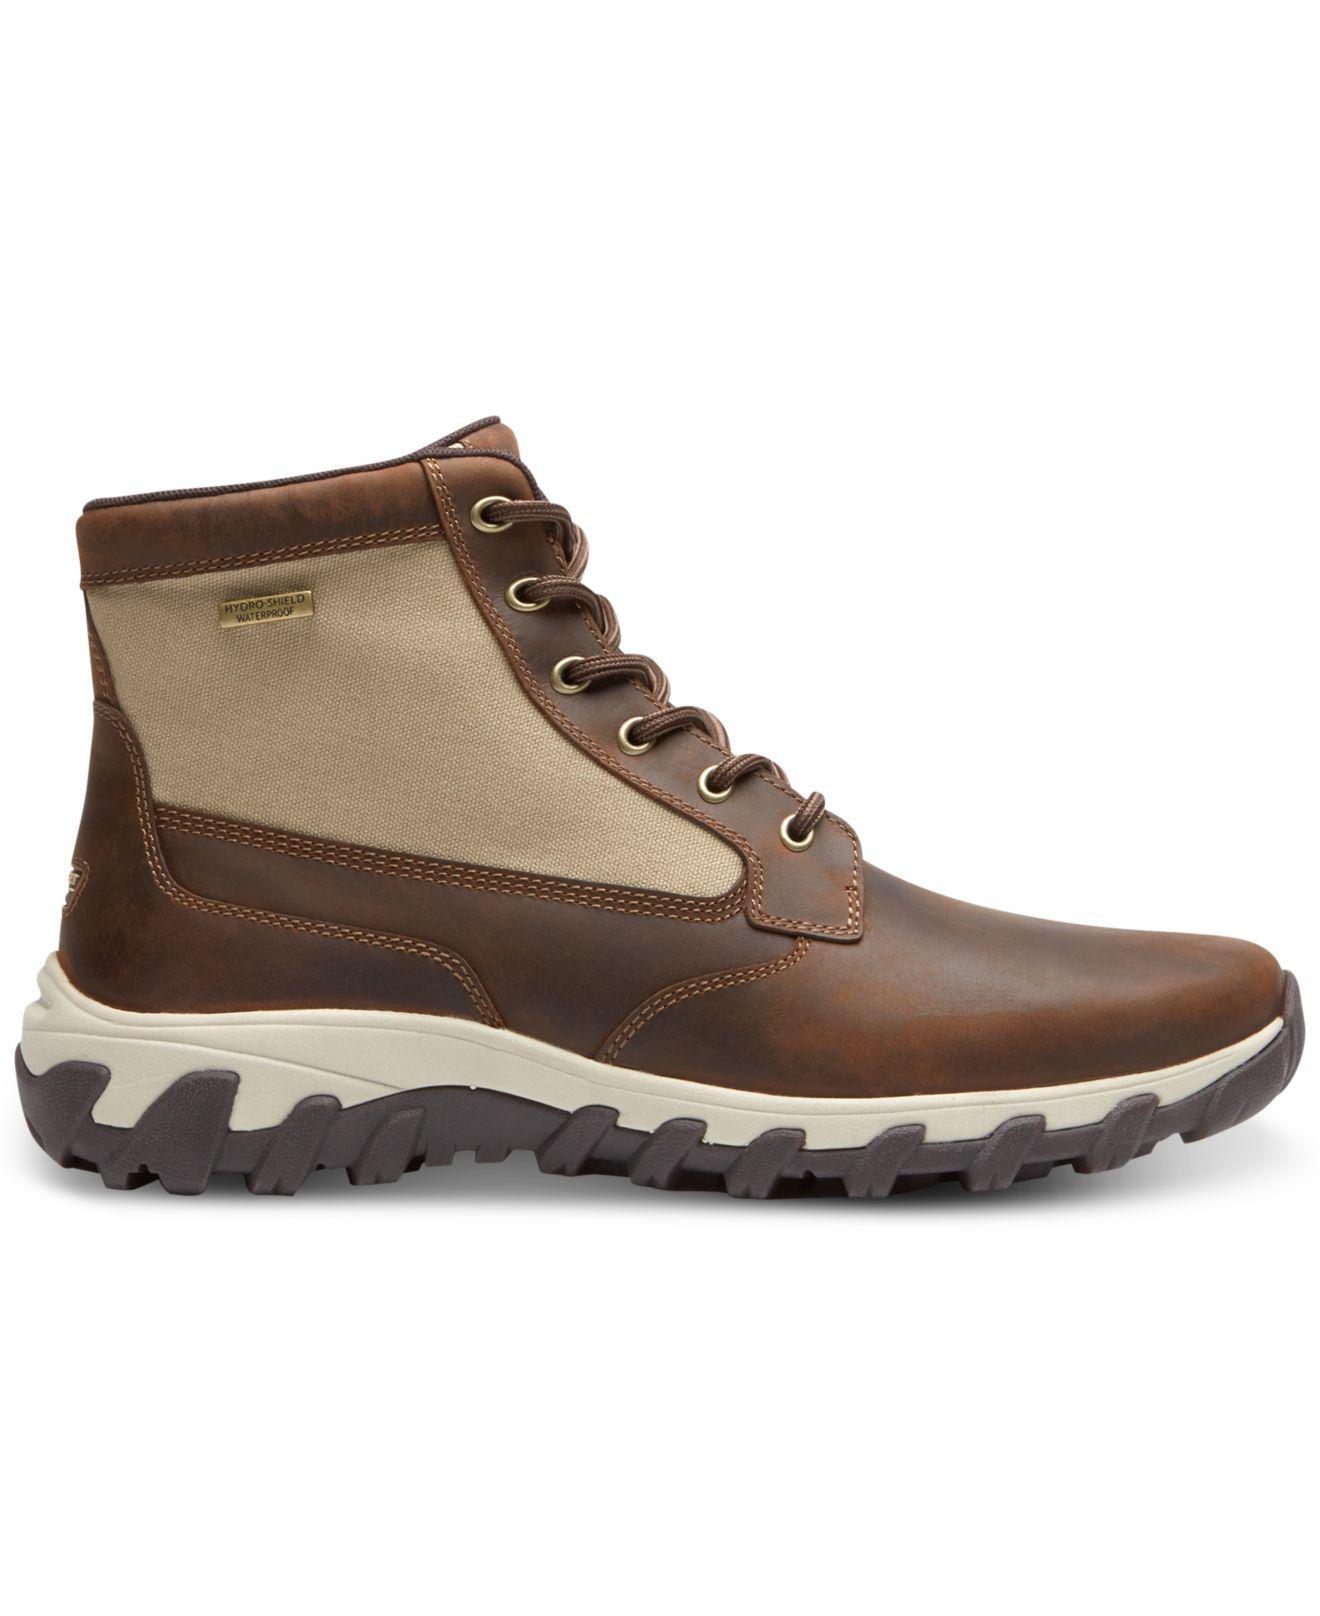 Cold Springs Plus Mid Waterproof Boots